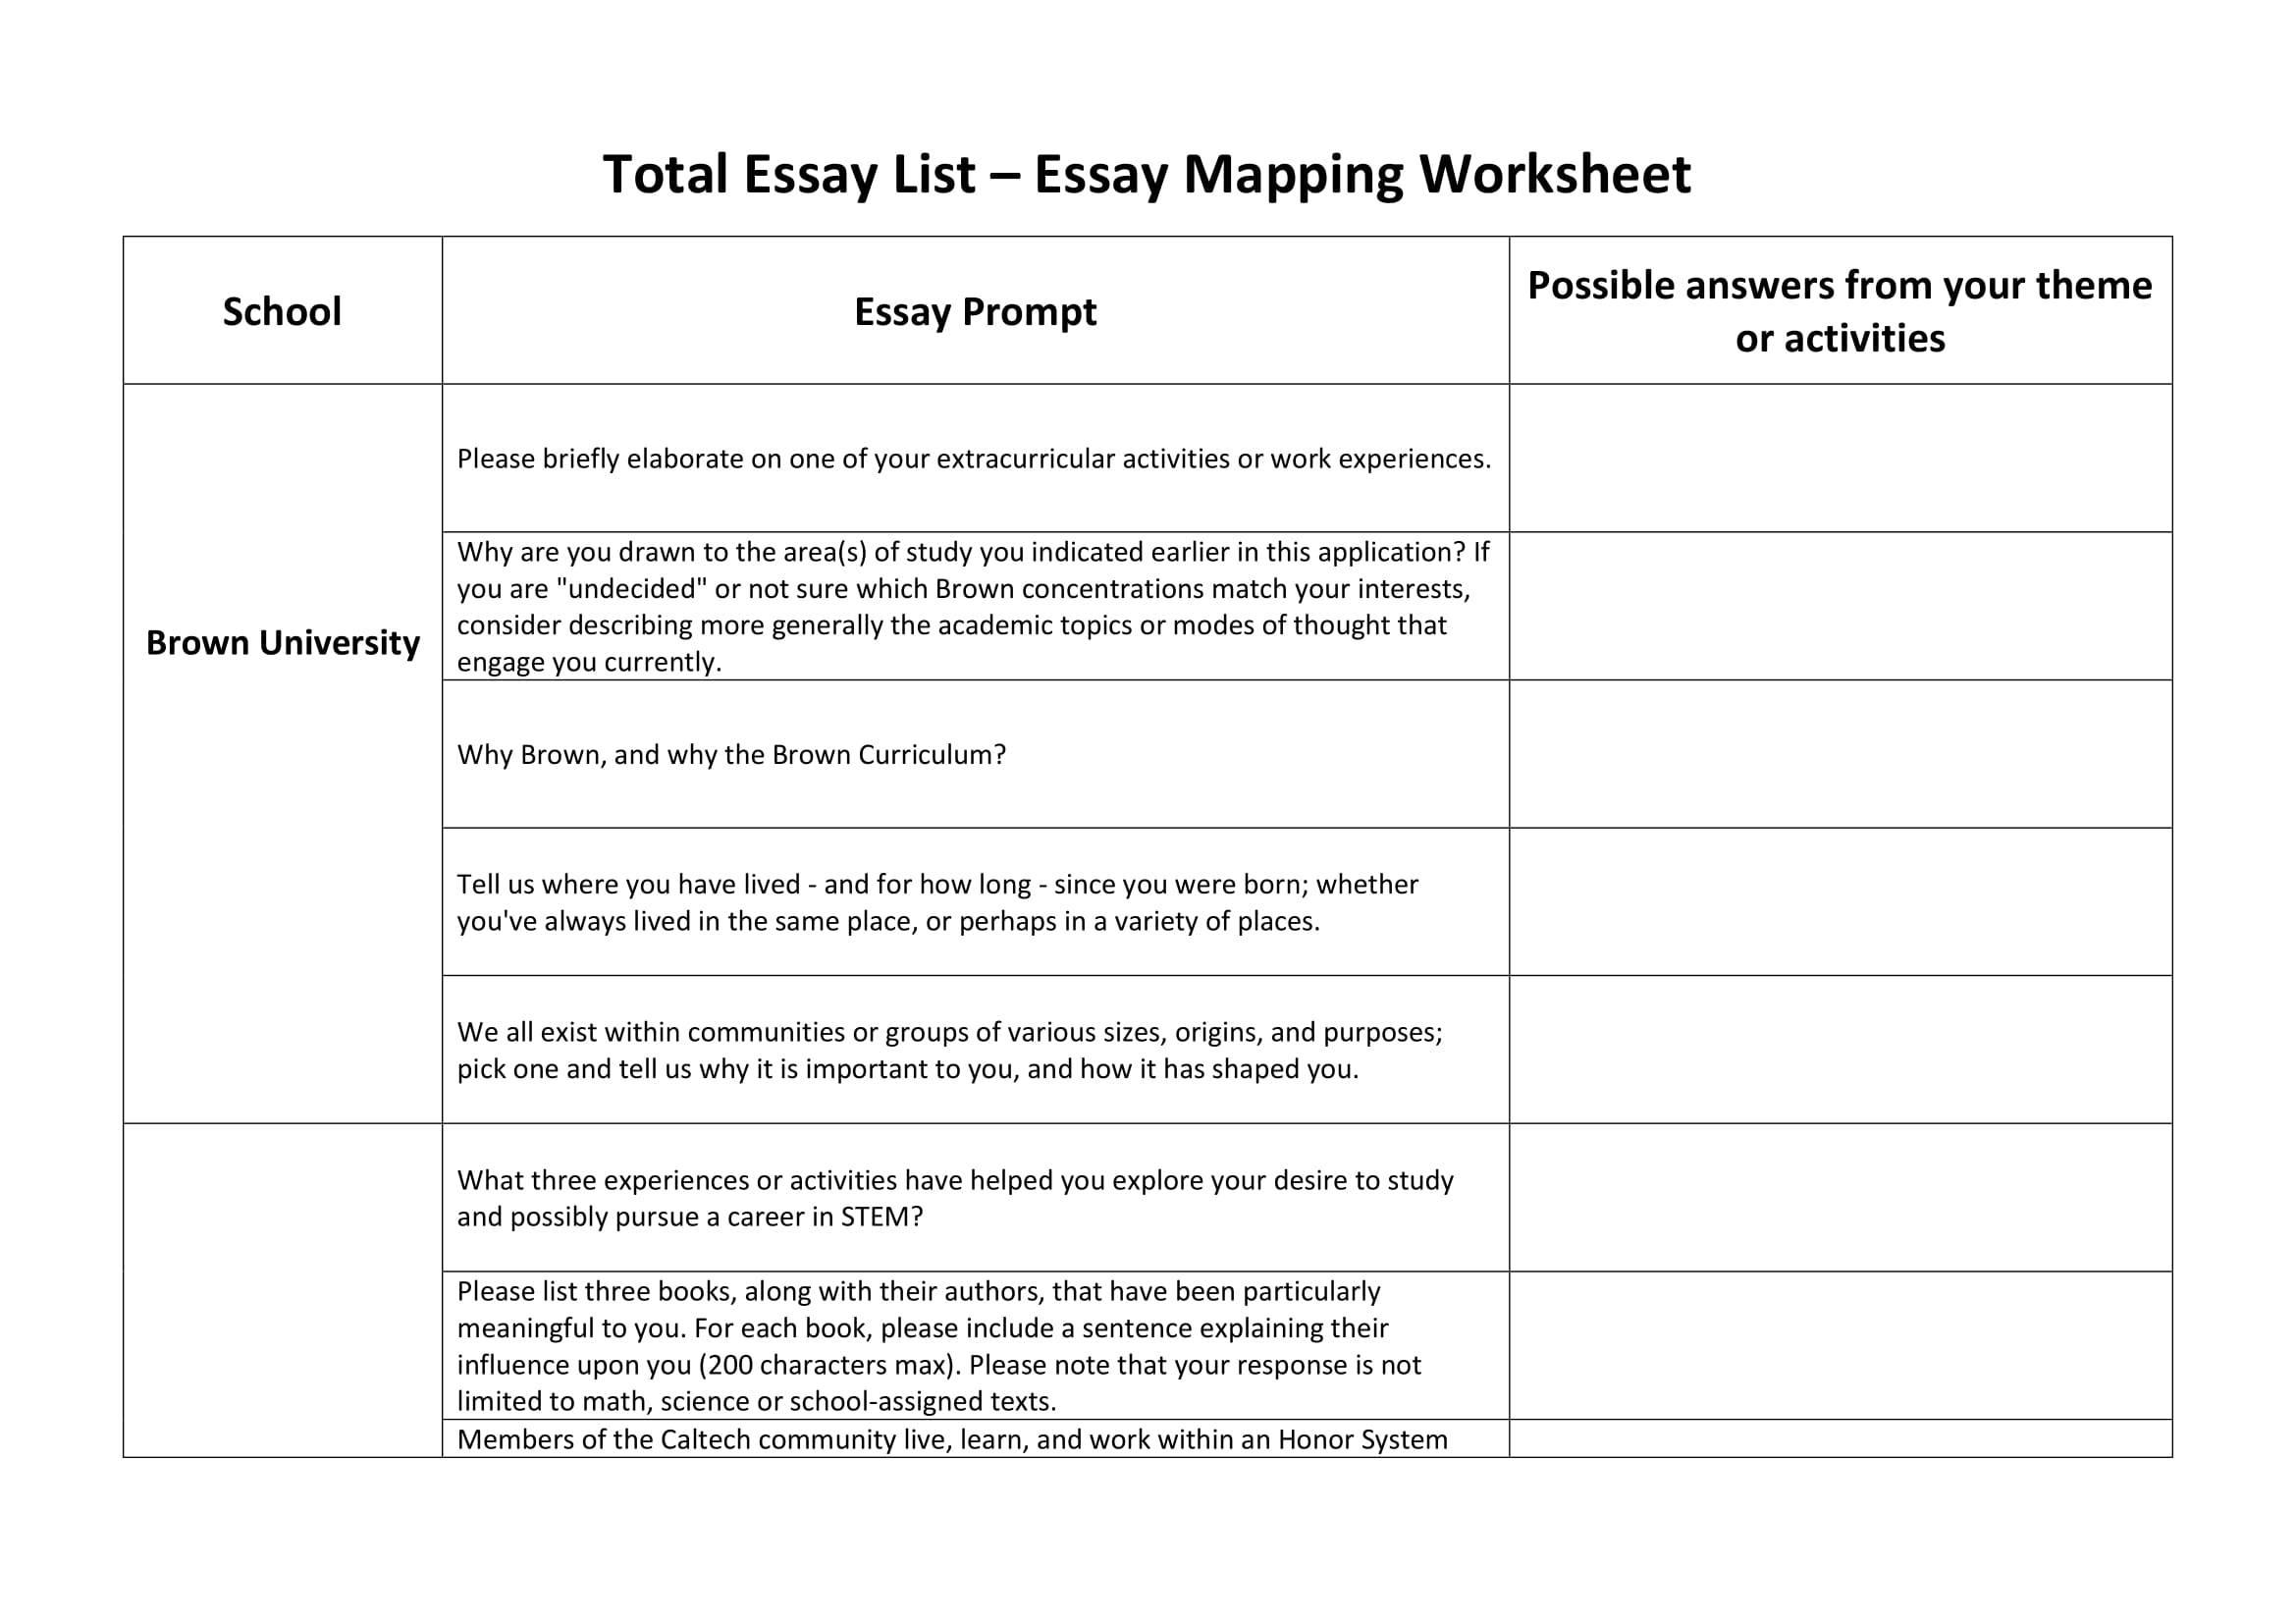 005 Module 1fit23392c1654ssl1 Caltech Essays Essay Magnificent Tips Application Questions Supplemental 2018 Full